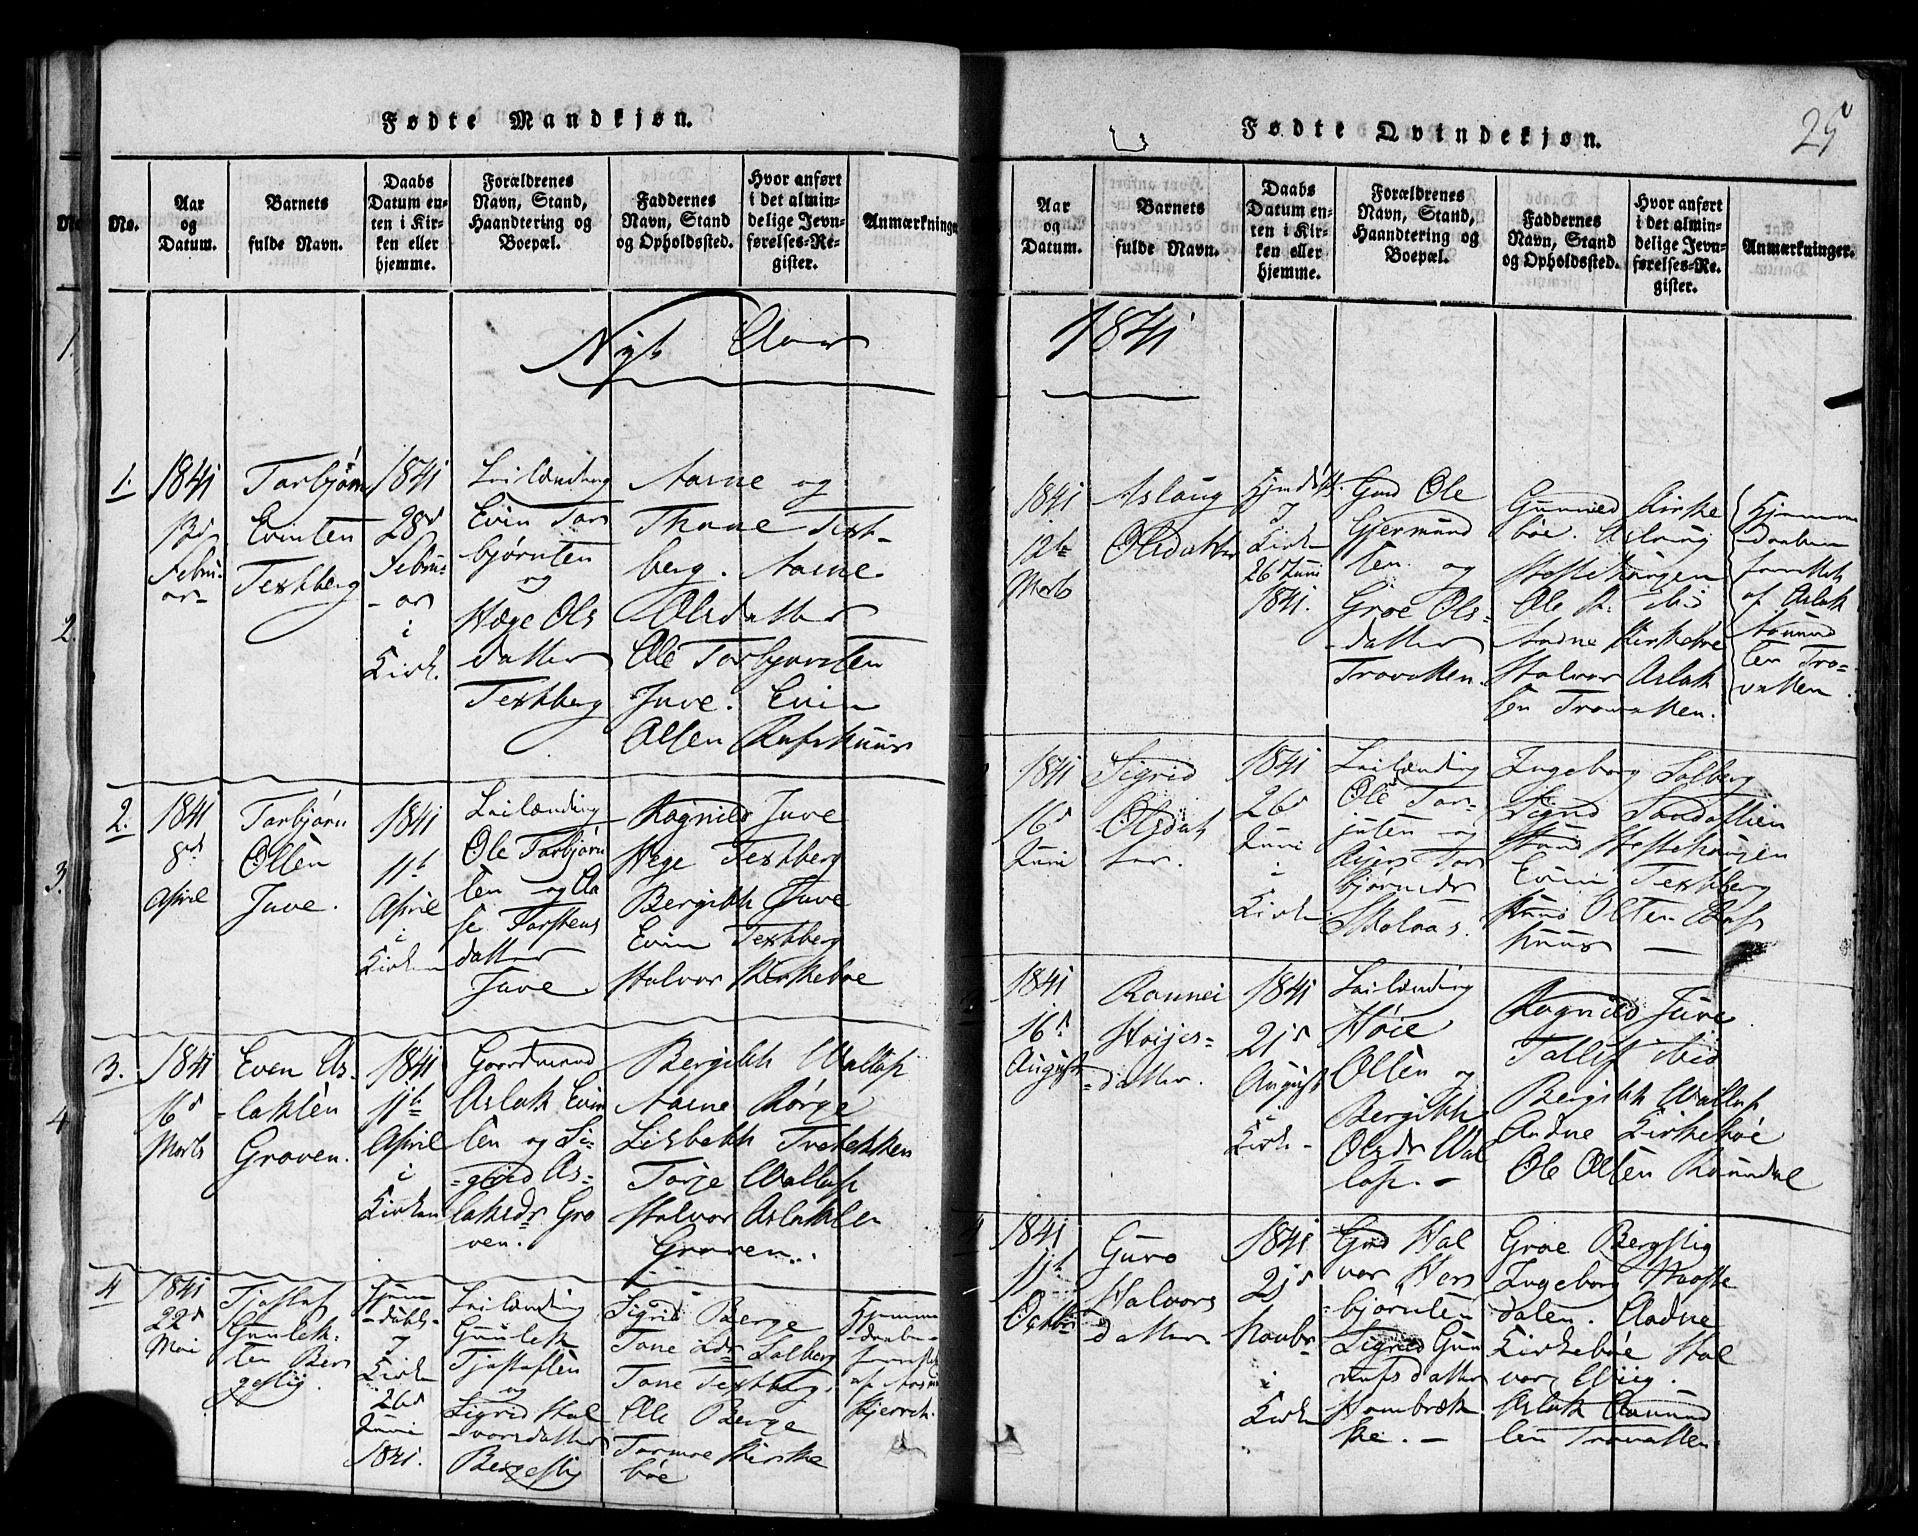 SAKO, Rauland kirkebøker, F/Fa/L0002: Ministerialbok nr. 2, 1815-1860, s. 25